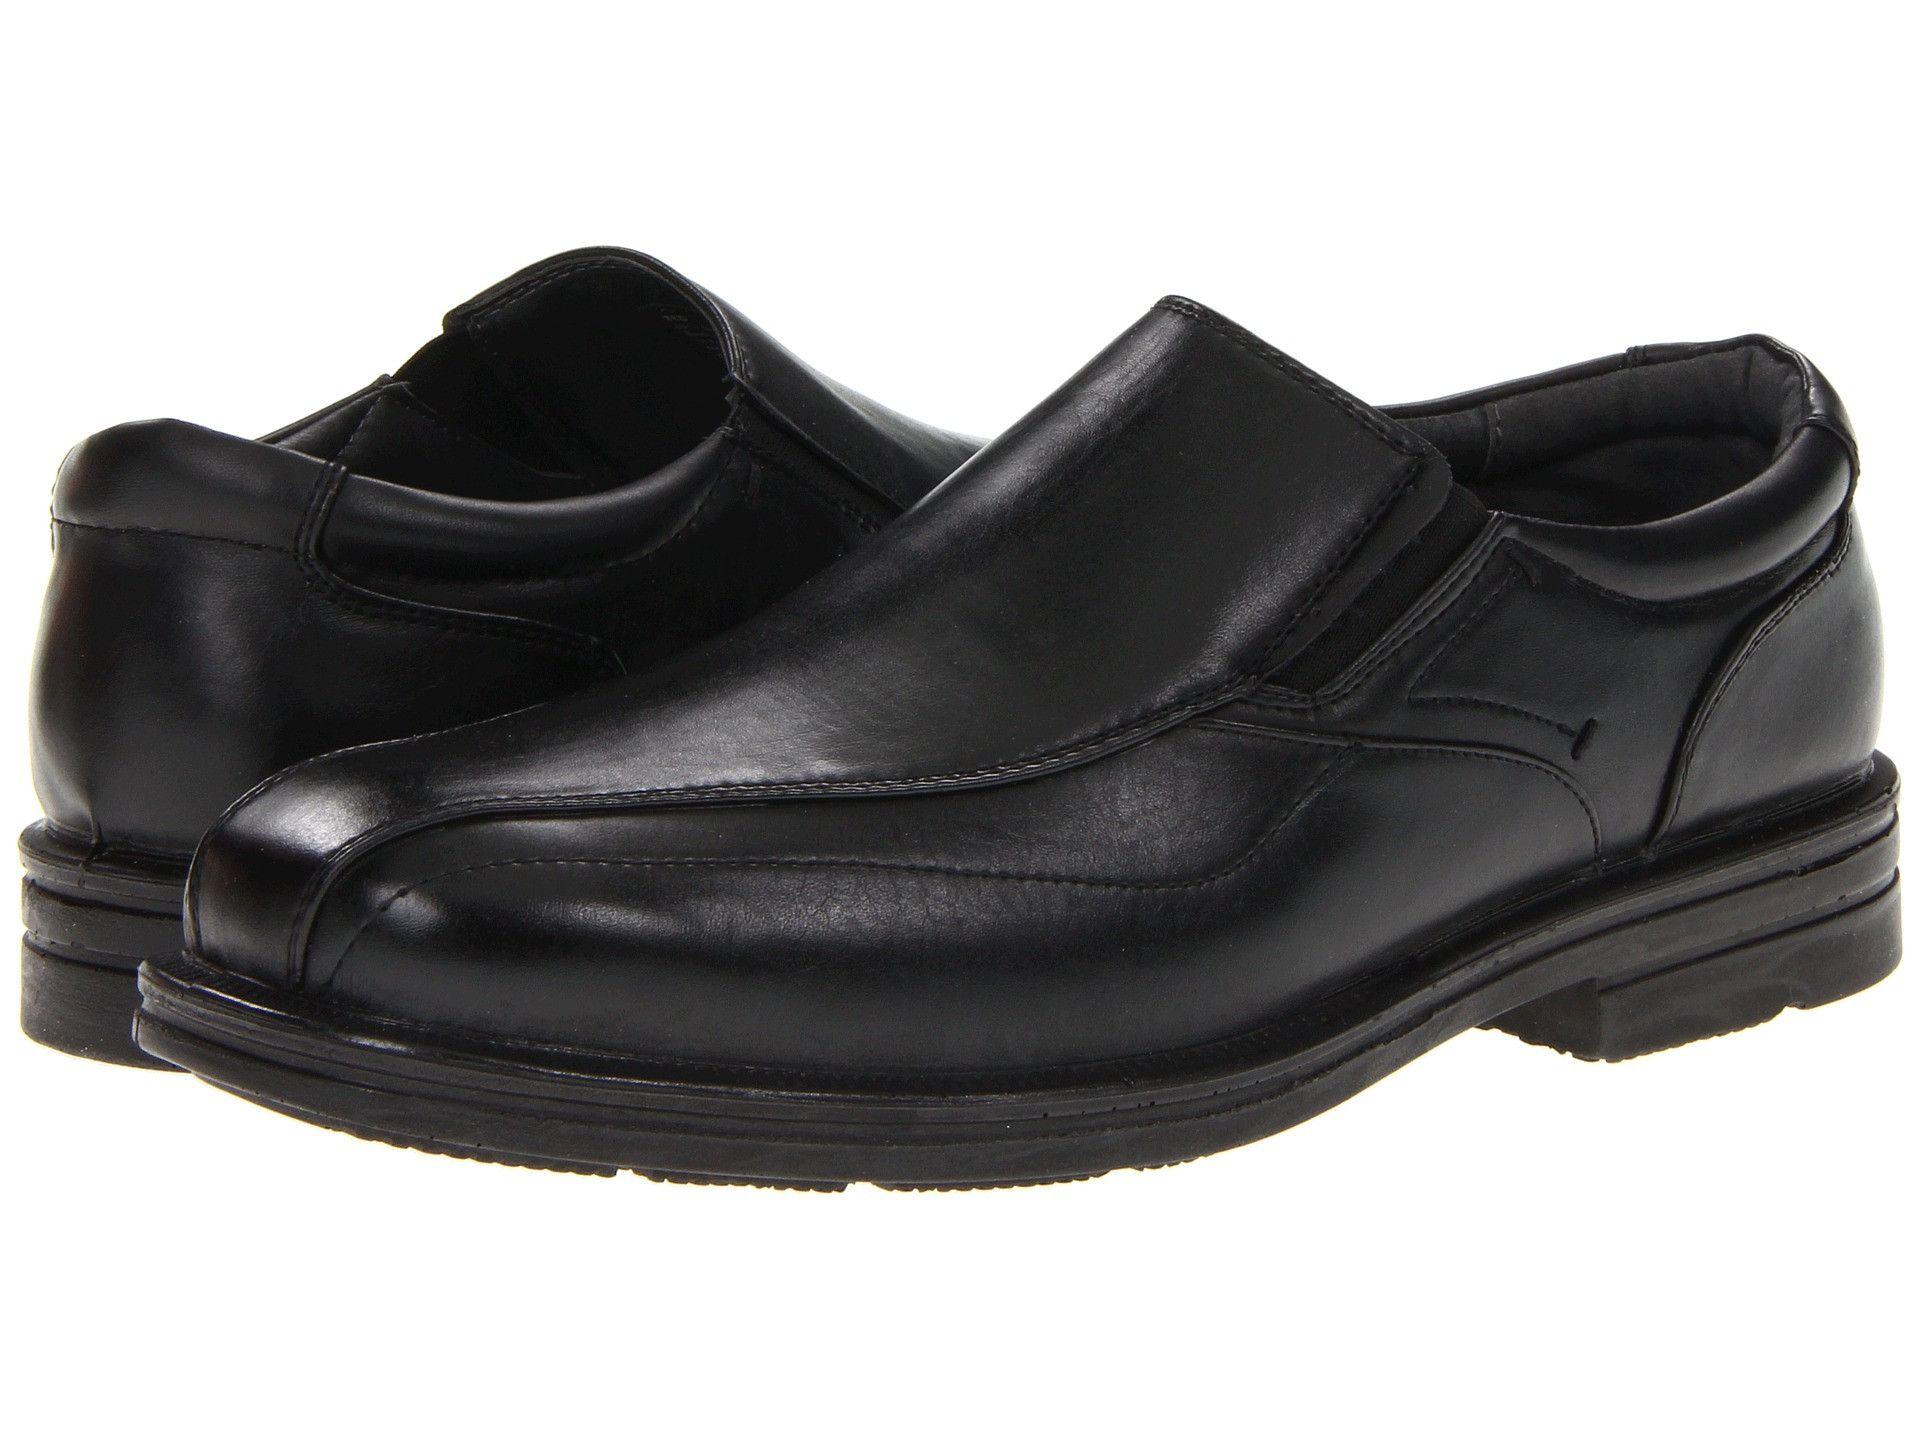 435aedb9dd9 Deer Stags Ted Men s Vegan Loafers (black) – Alternative Outfitters Vegan  Store